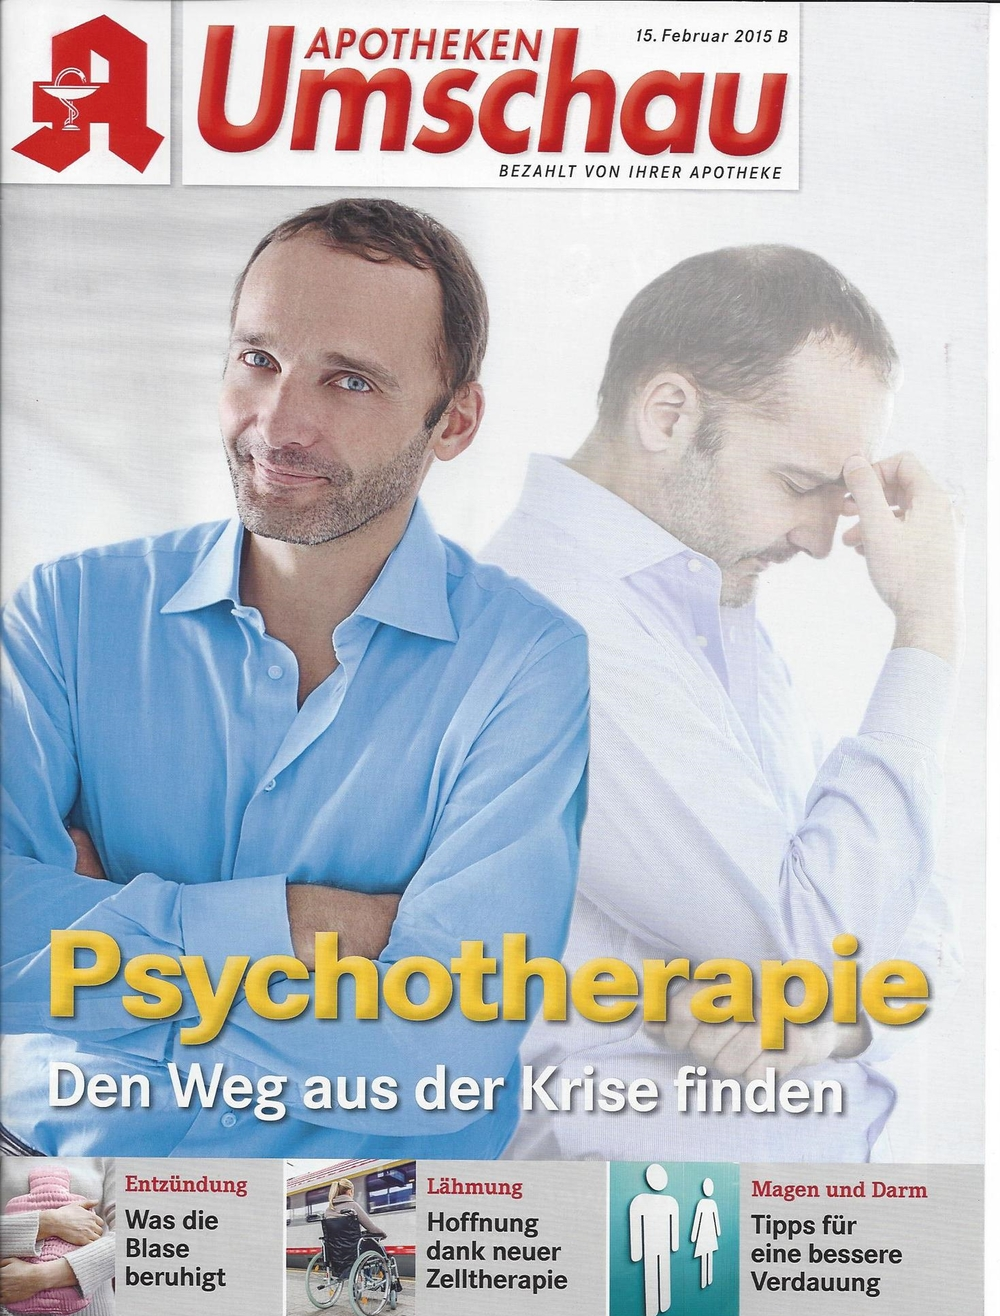 Apotheken Umschau Deckblatt 15.2.15.jpg